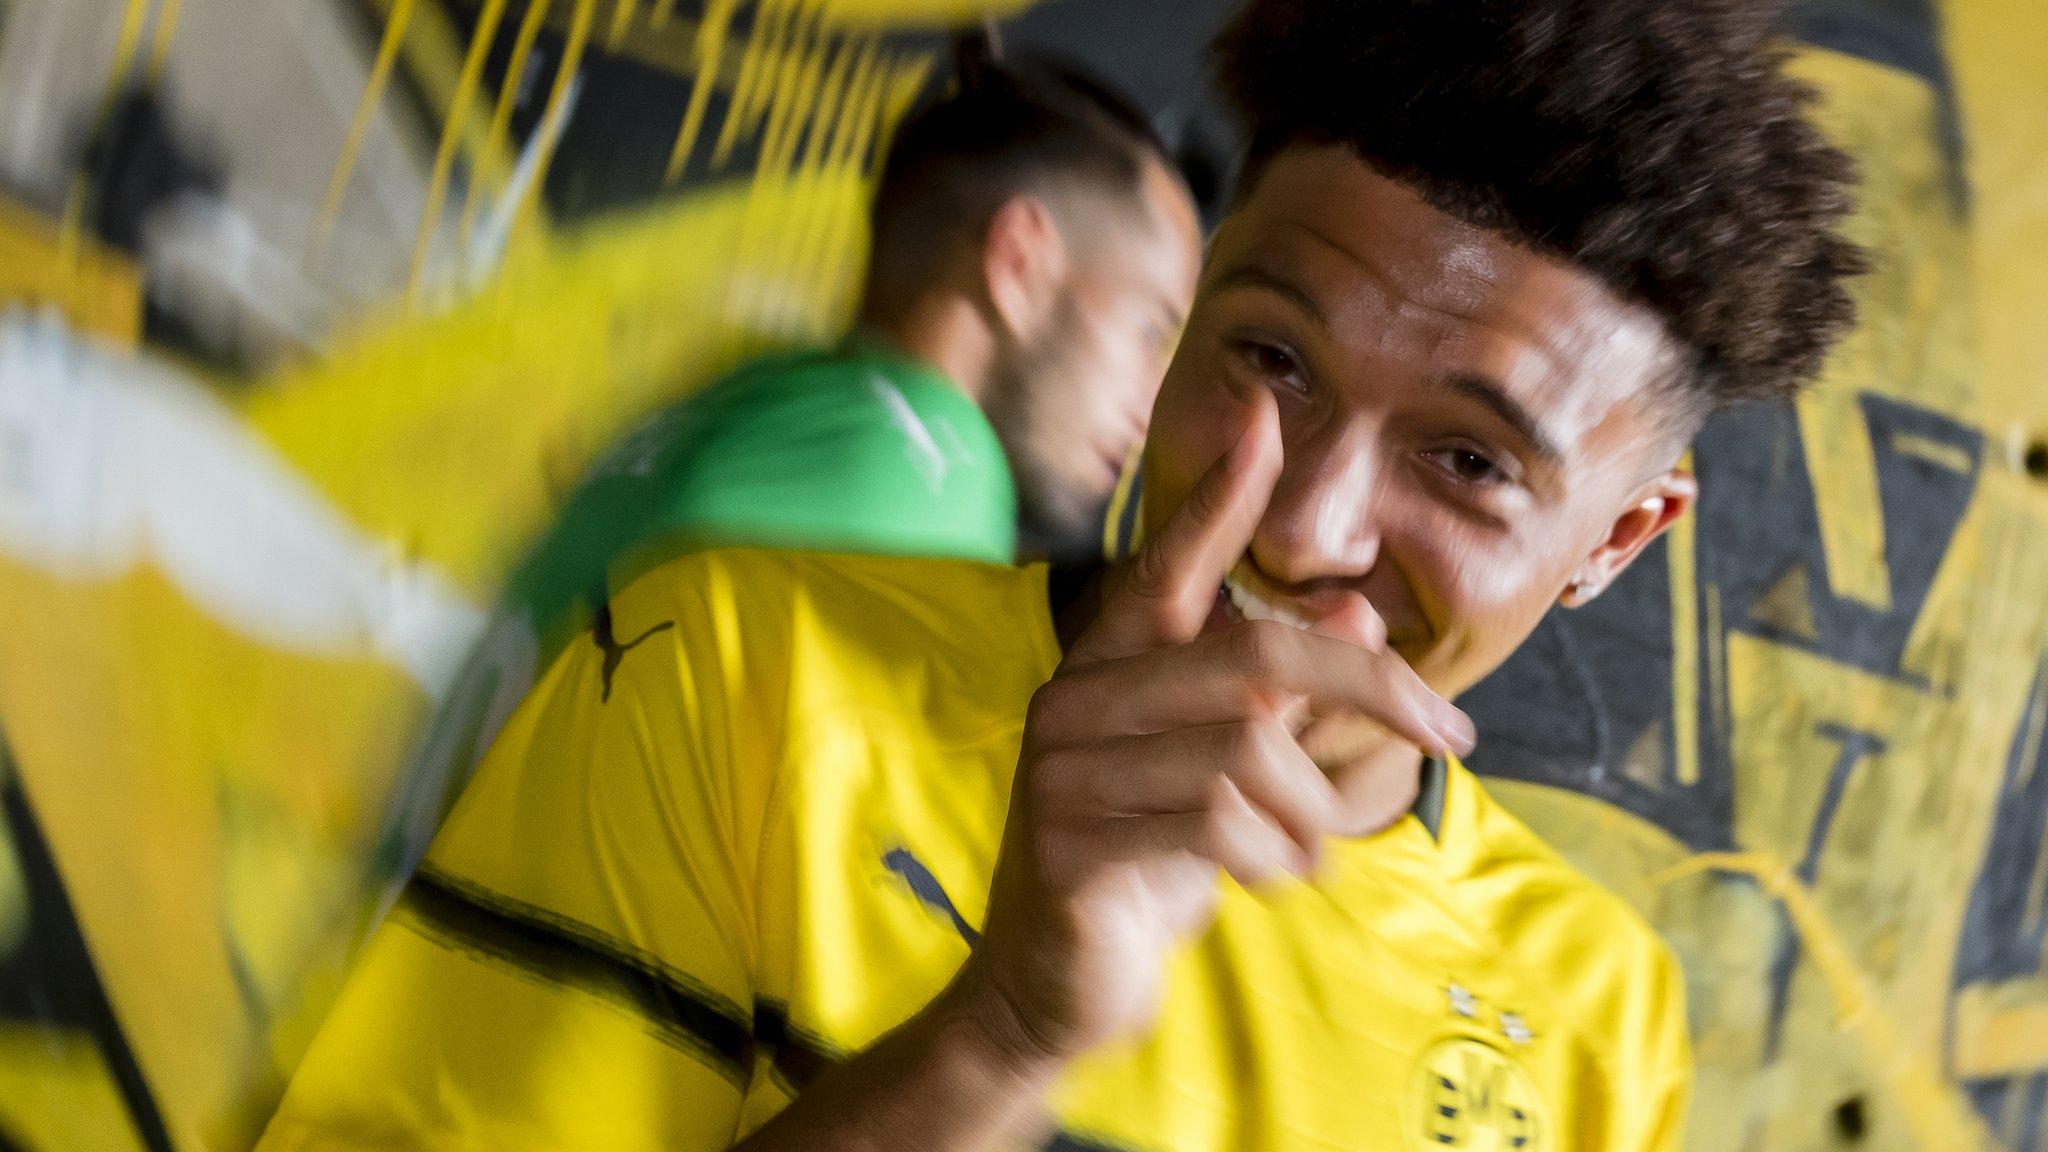 Manchester City v Borussia Dortmund: Jadon Sancho scouting report